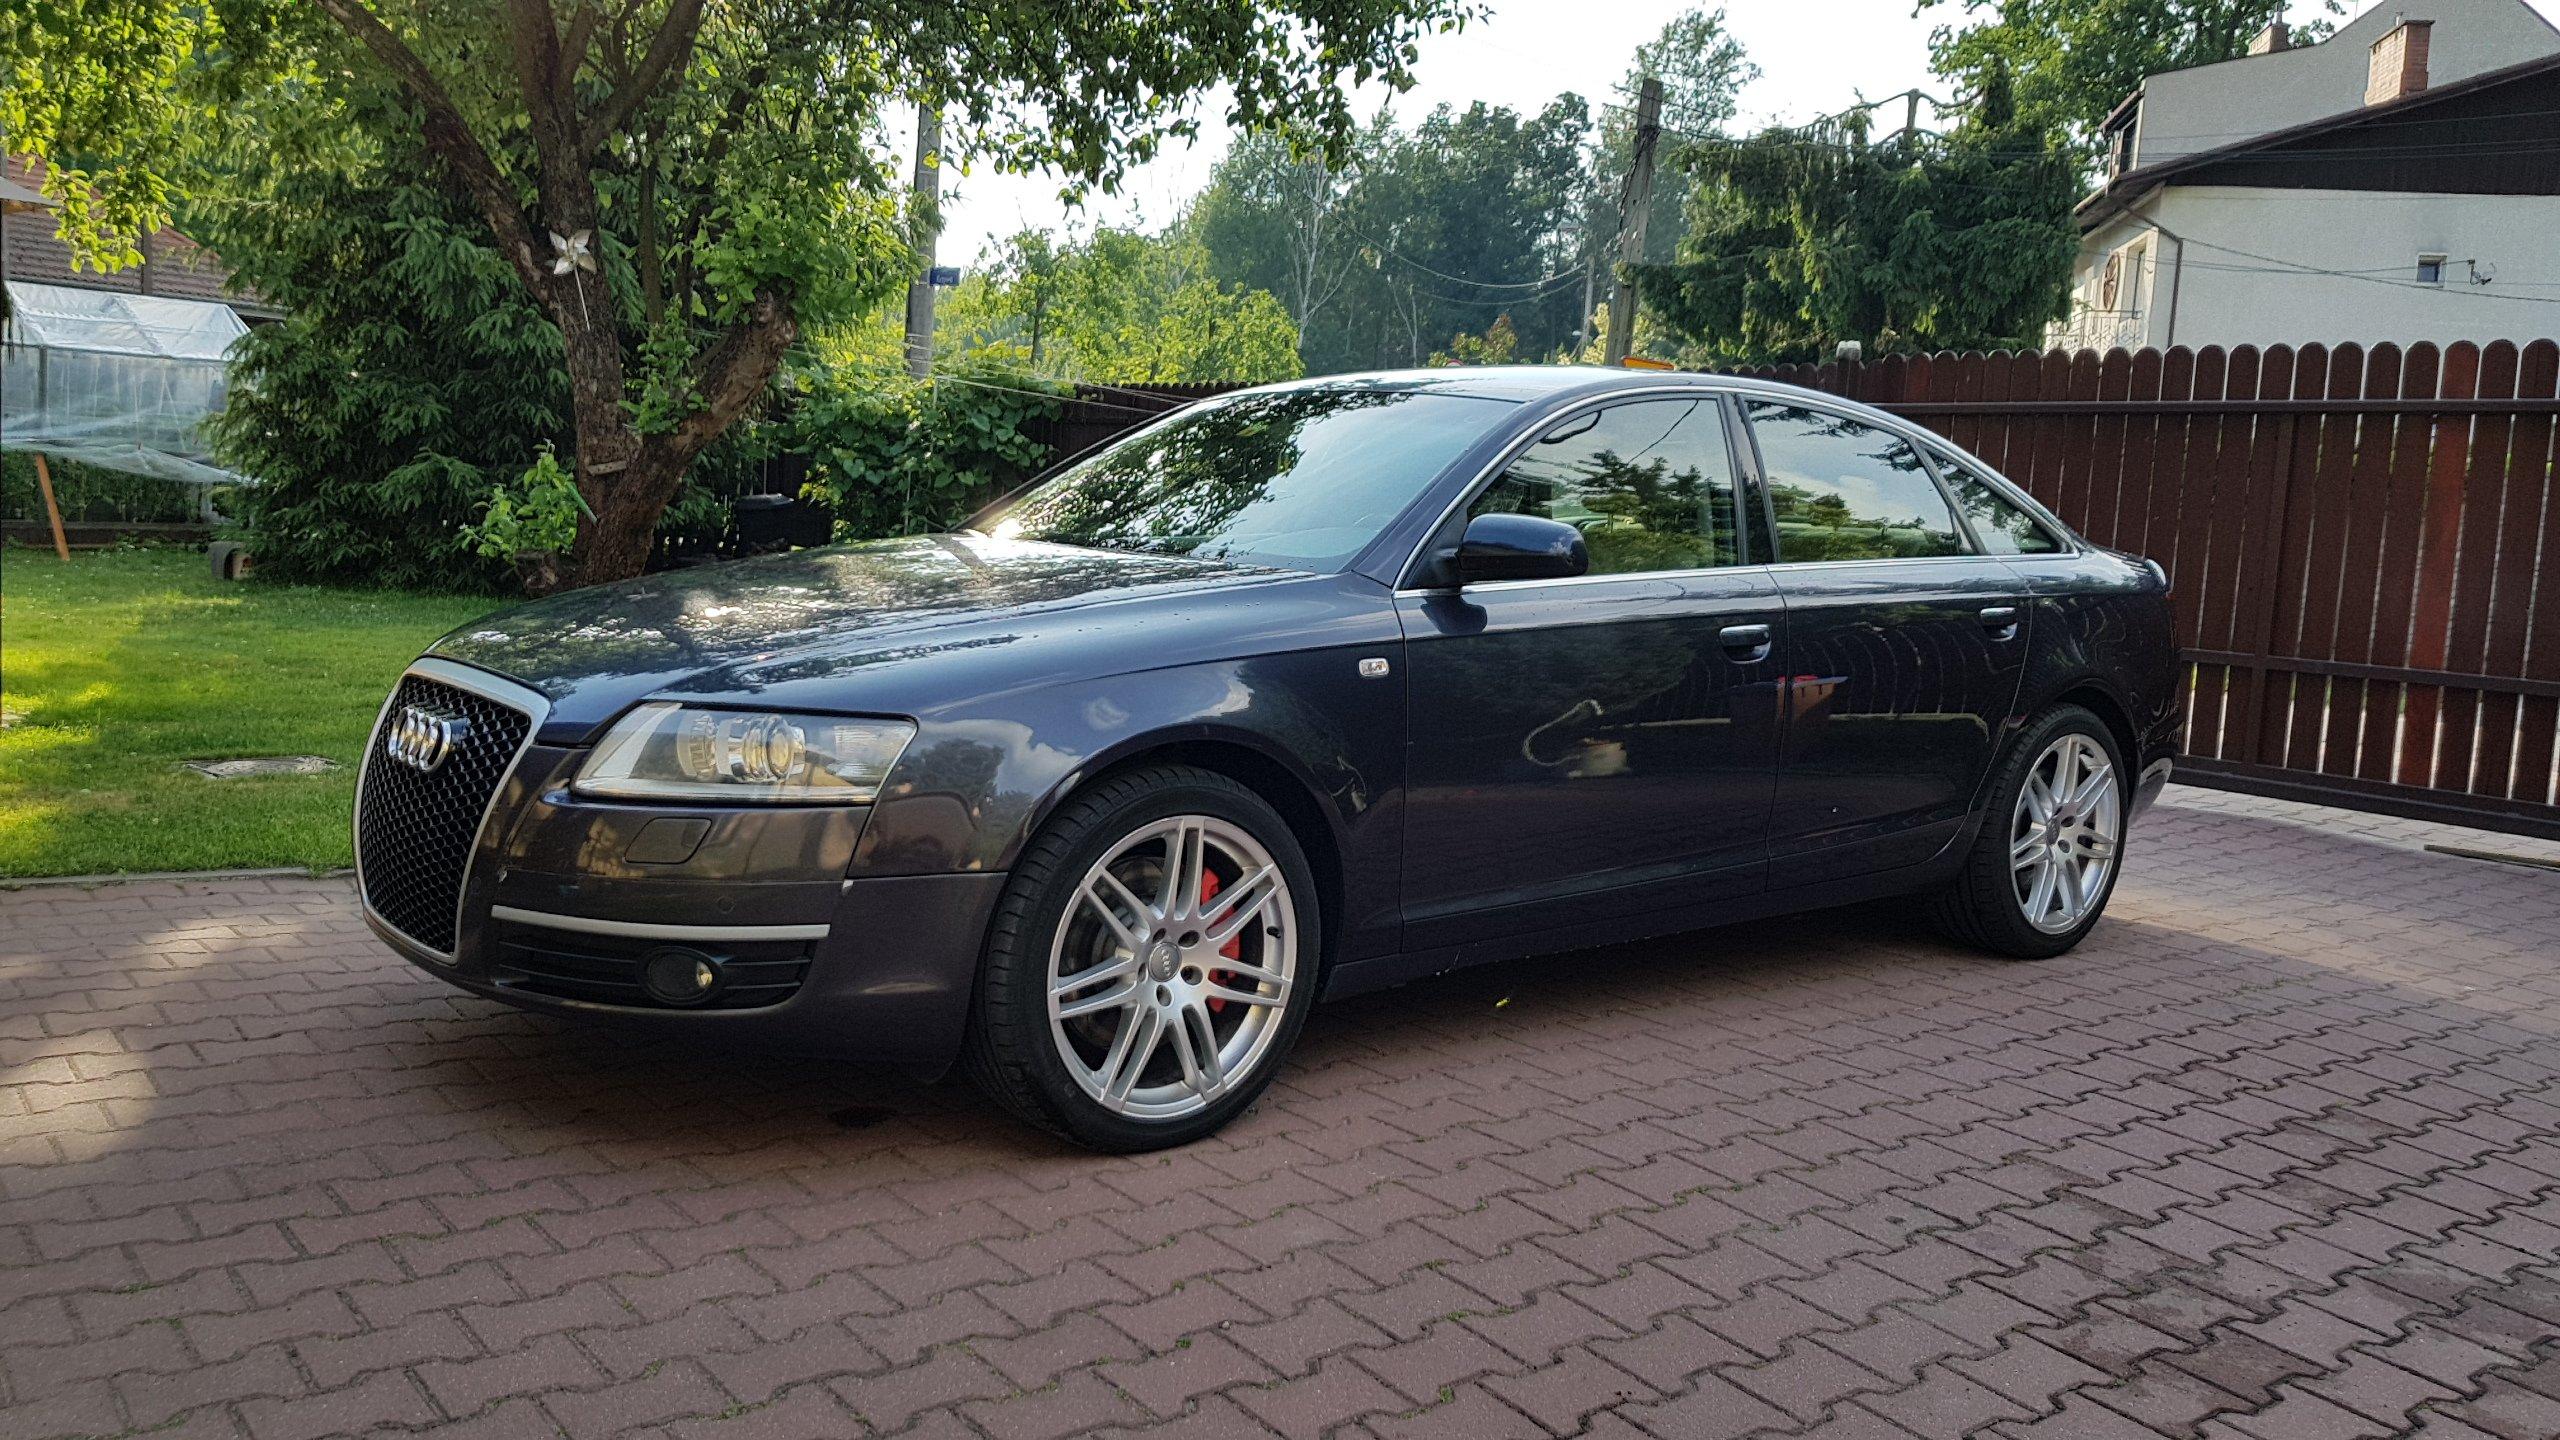 Audi A6 C6 42l 335 Km Gaz Quattro Tiptronic 7382740151